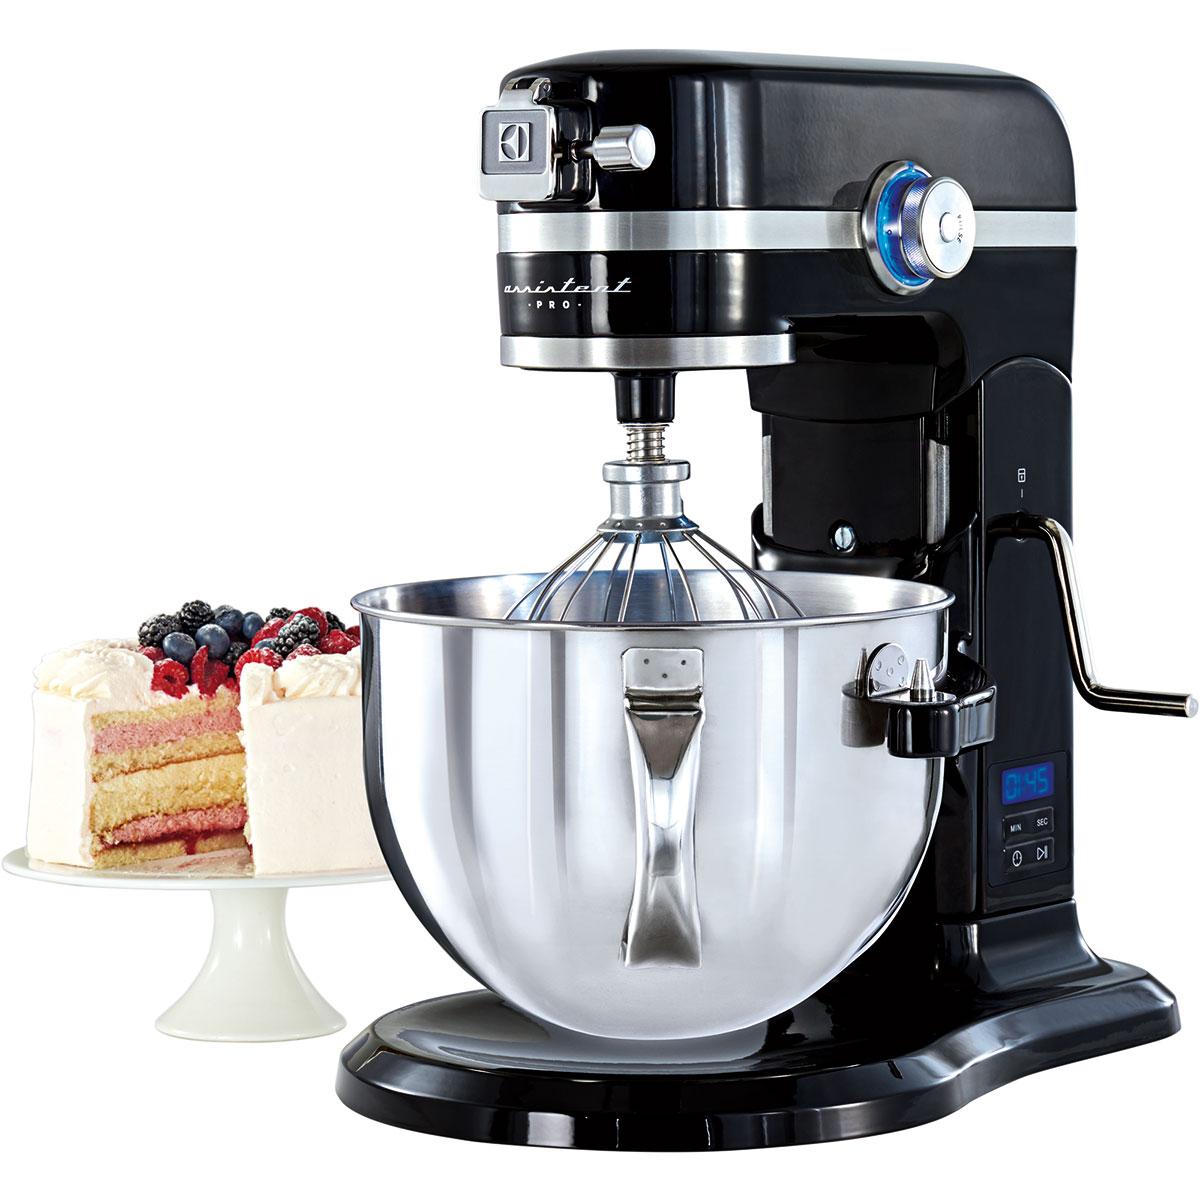 Electrolux køkkenmaskine - AssistentPRO EKM6000 - Sort